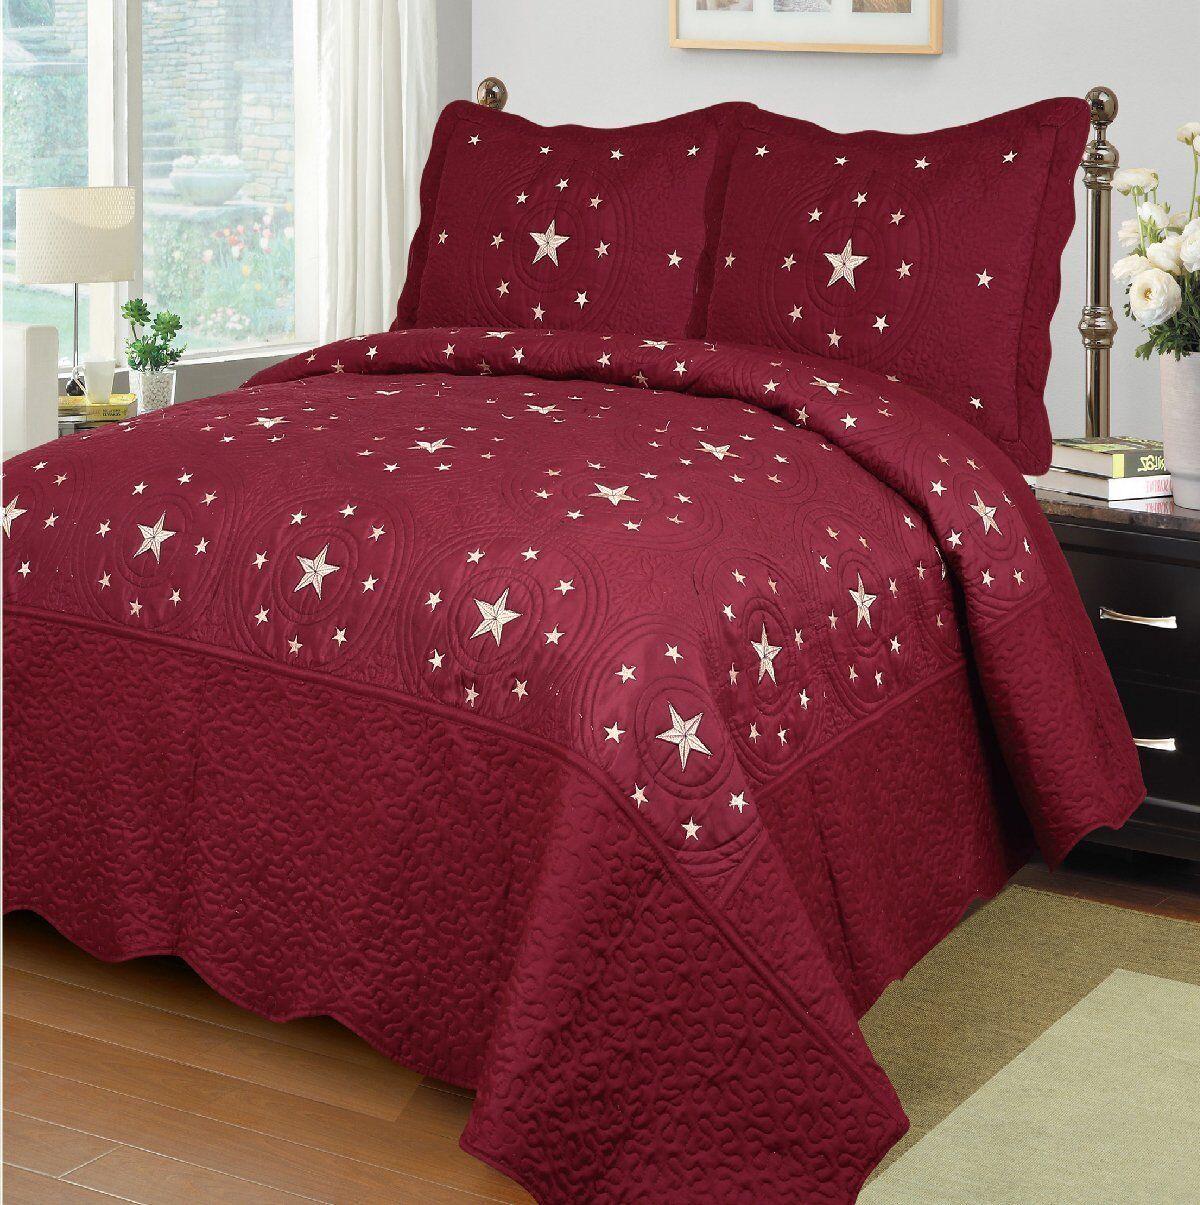 Fancy Linen 3pc Burgundy Star Bedspread Quilt Set Embroidery